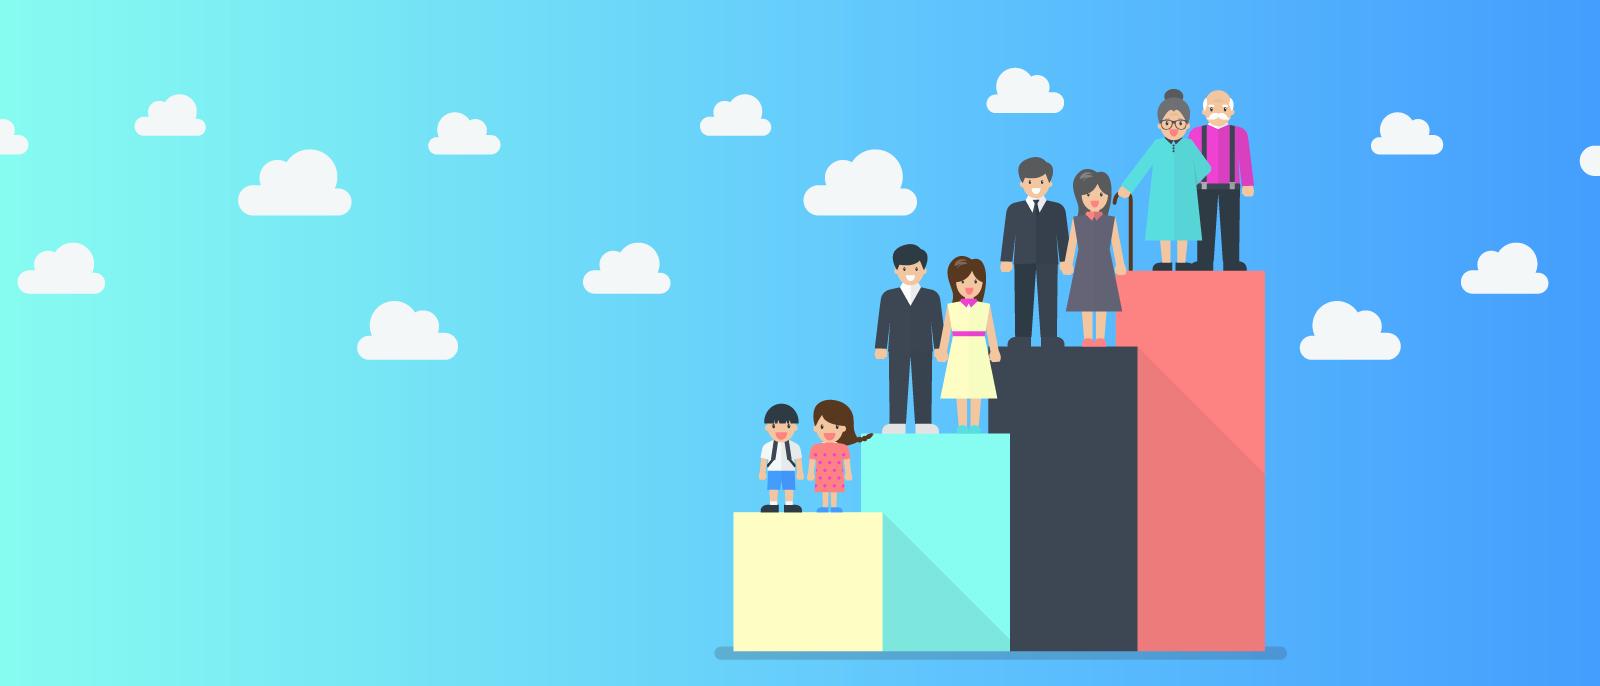 Make A Kinship Diagram Online Best Of How to Make A Kinship Diagram Line